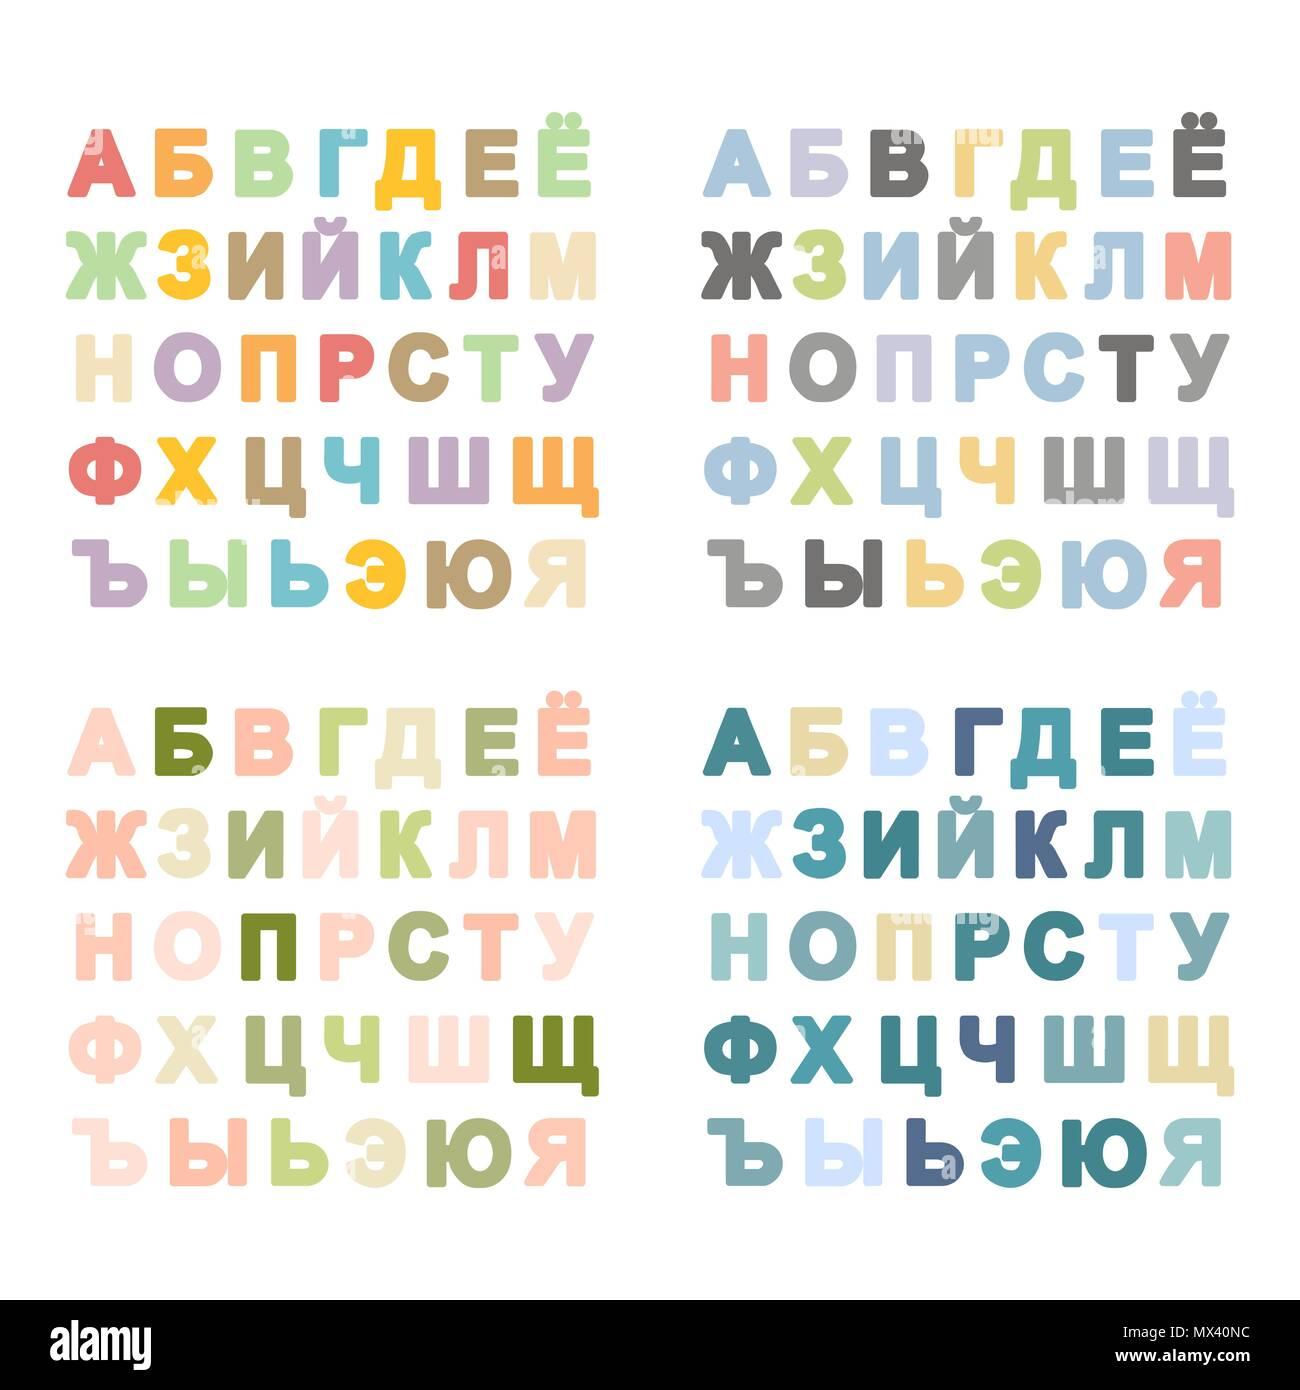 Russian Alphabet Stock Photos Amp Russian Alphabet Stock